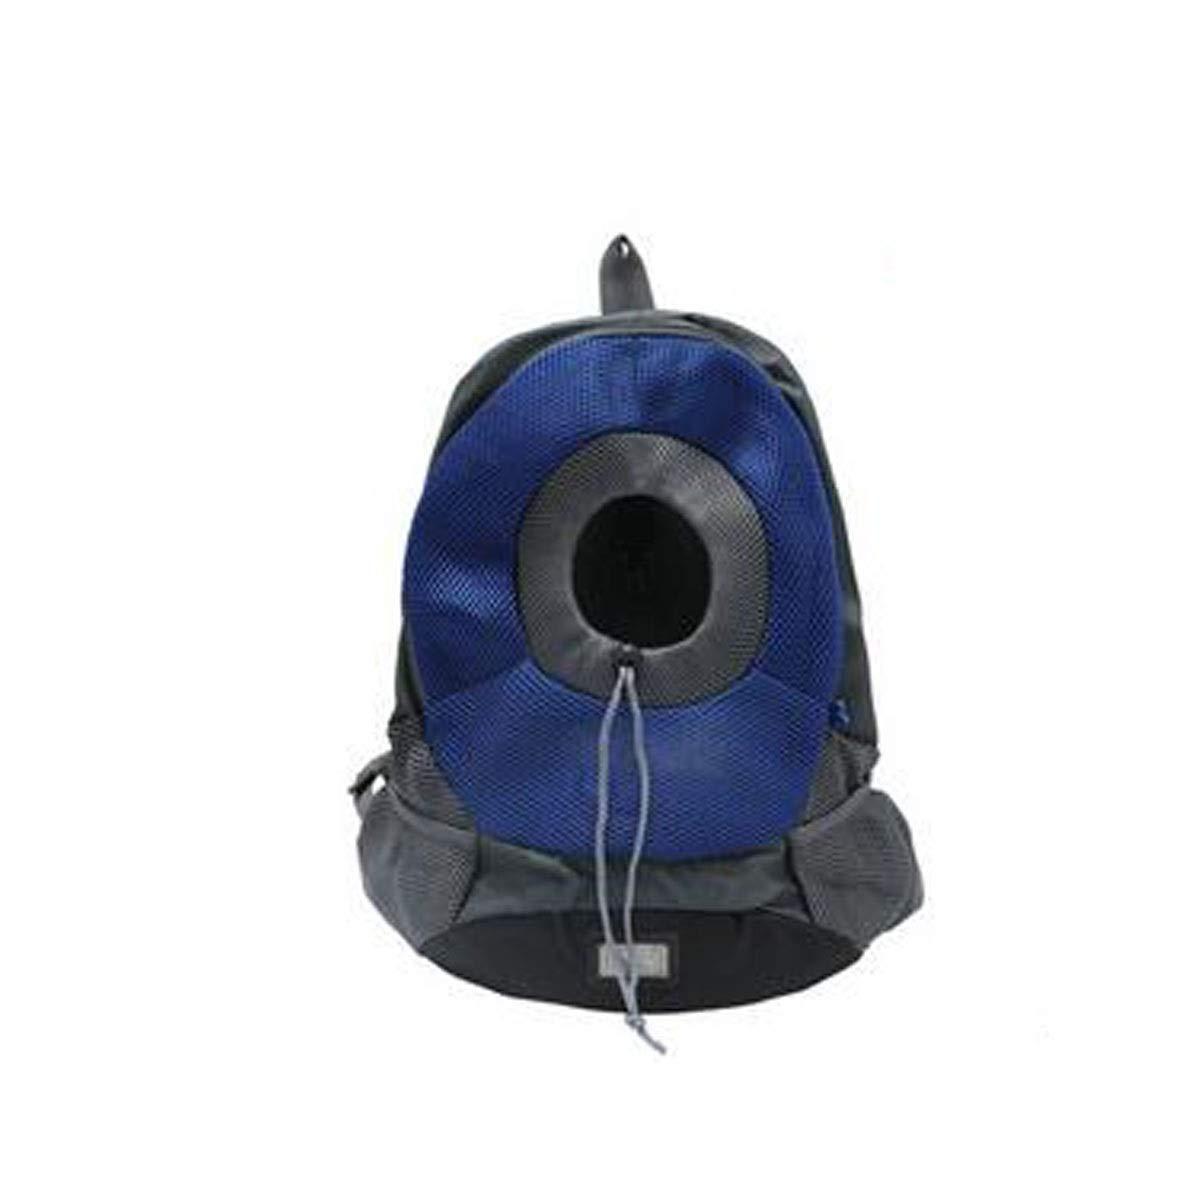 c6ea2f3c8590 bluee Guyuexuan Outdoor Travel Dog Cat Backpack, Puppy Pet Front ...